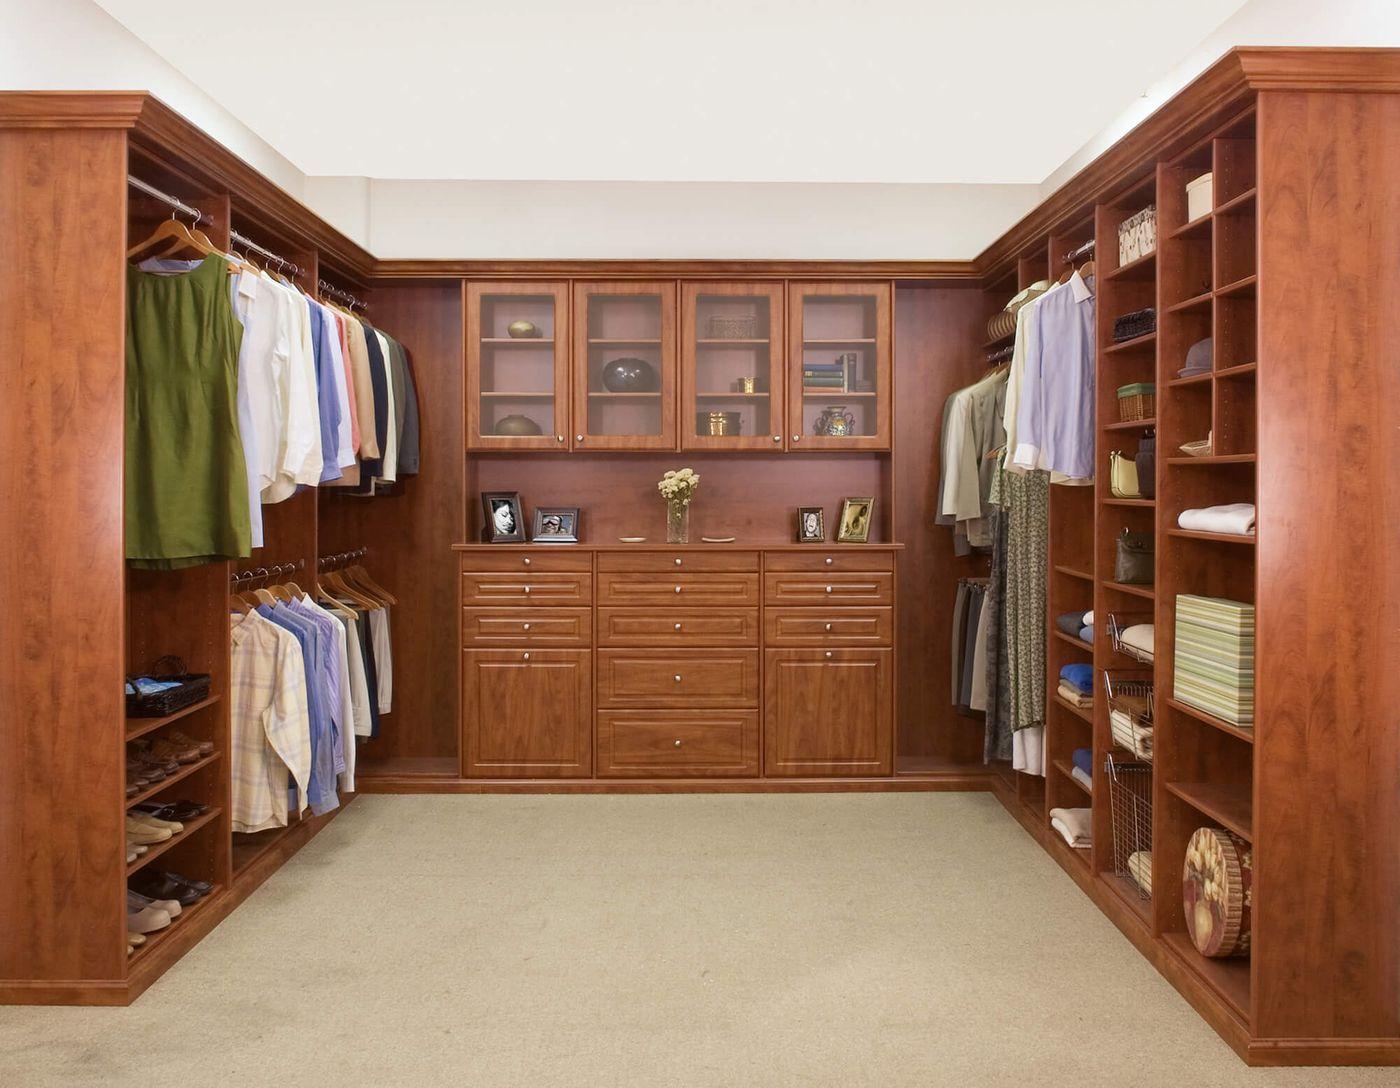 1-Closet-WI-1a-CBD-2008.jpg